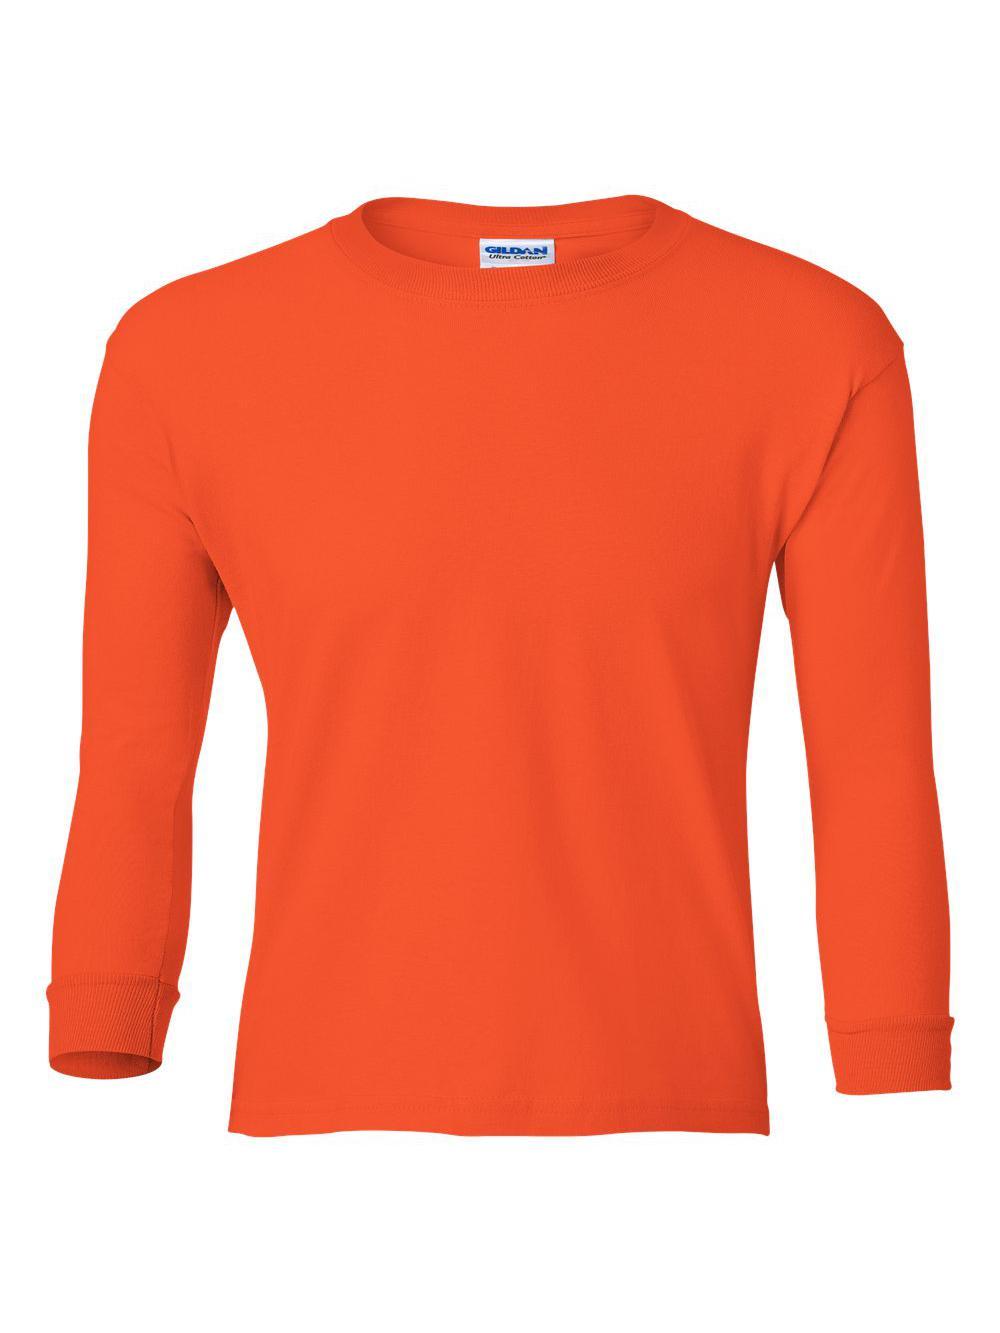 Gildan-Ultra-Cotton-Youth-Long-Sleeve-T-Shirt-2400B thumbnail 27